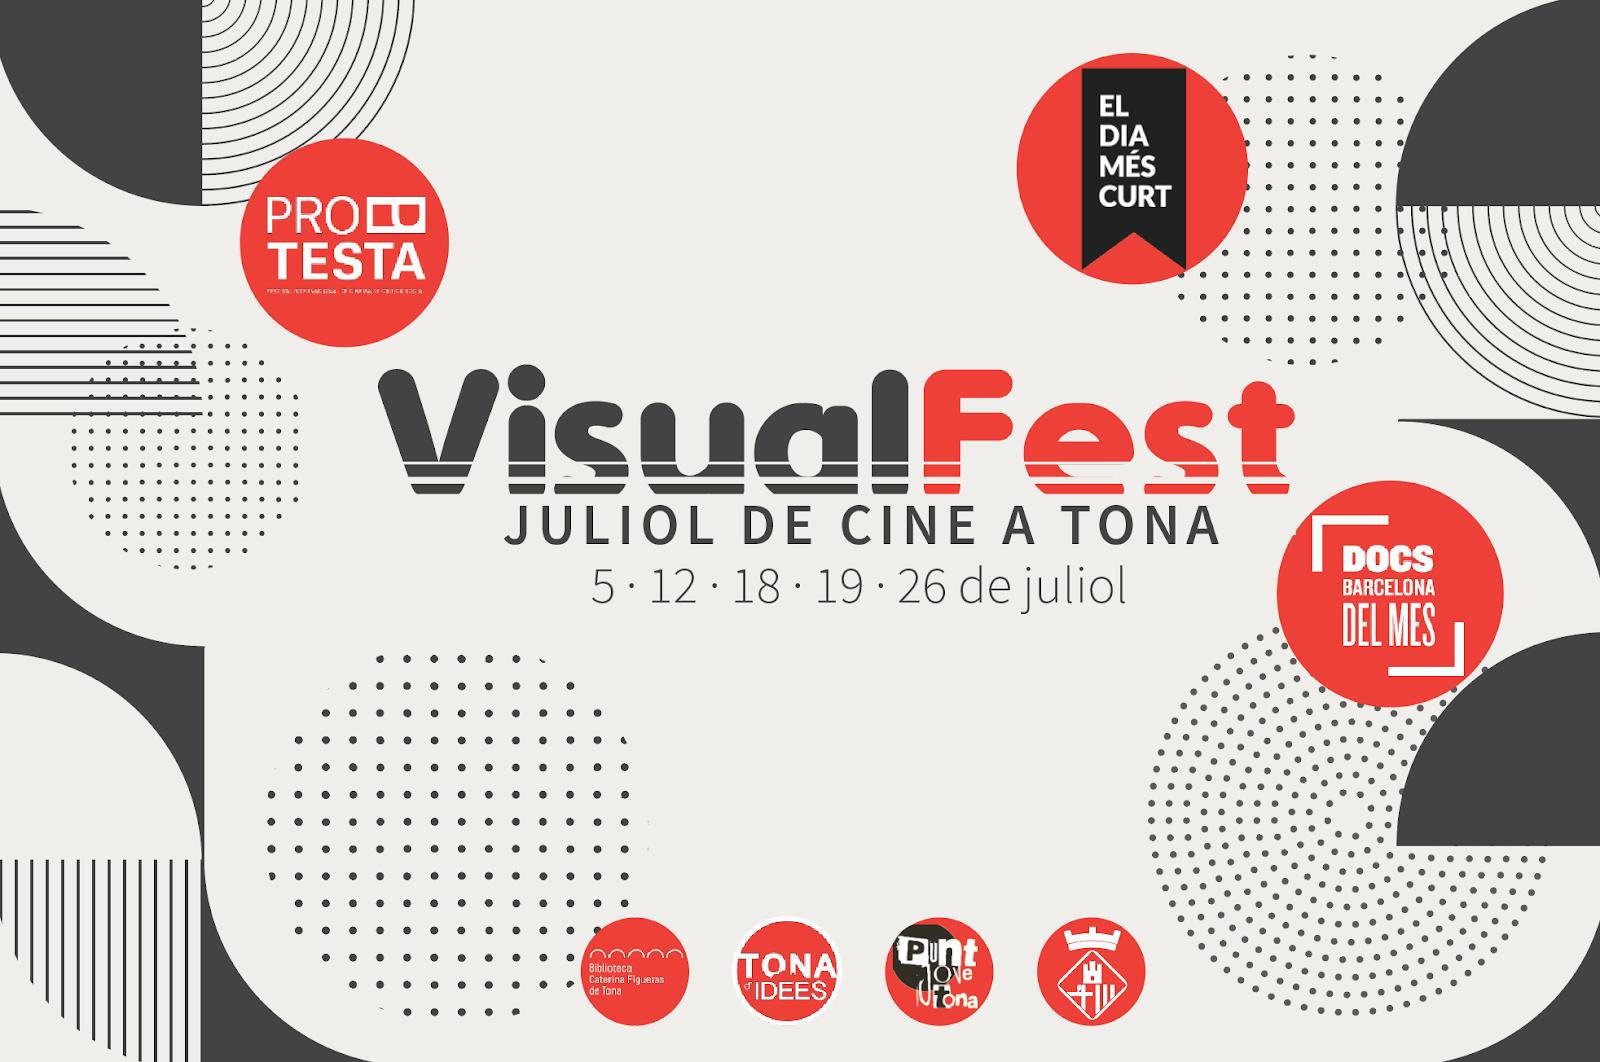 Visual Fest biblioteca tona